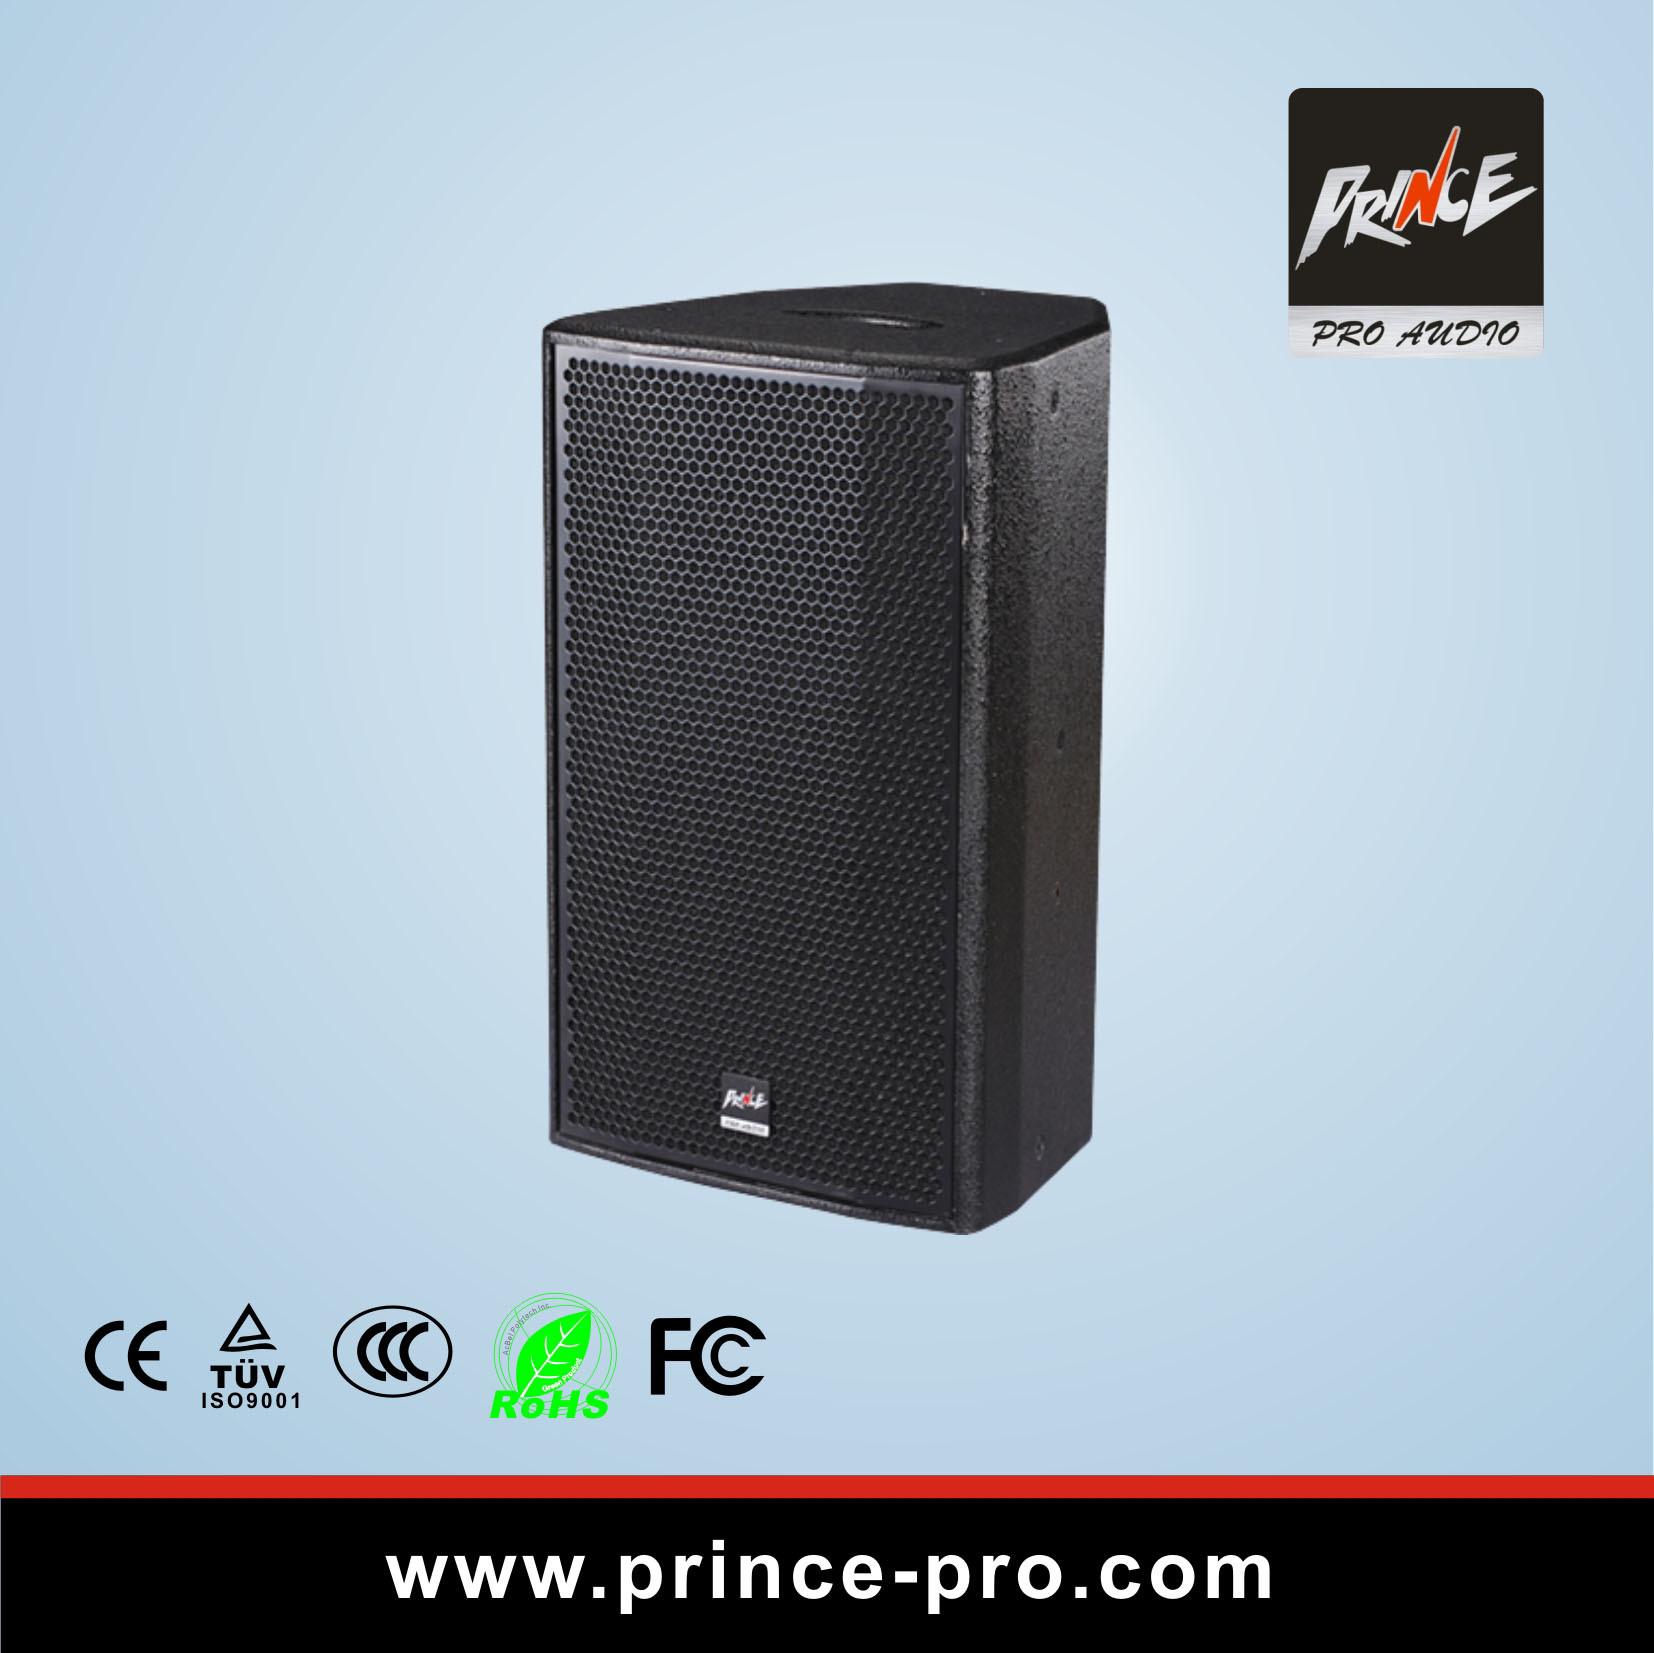 15 Inch Full Range Speaker PA Speakers for Concerts DJ Sound System High Performance Subwoofer